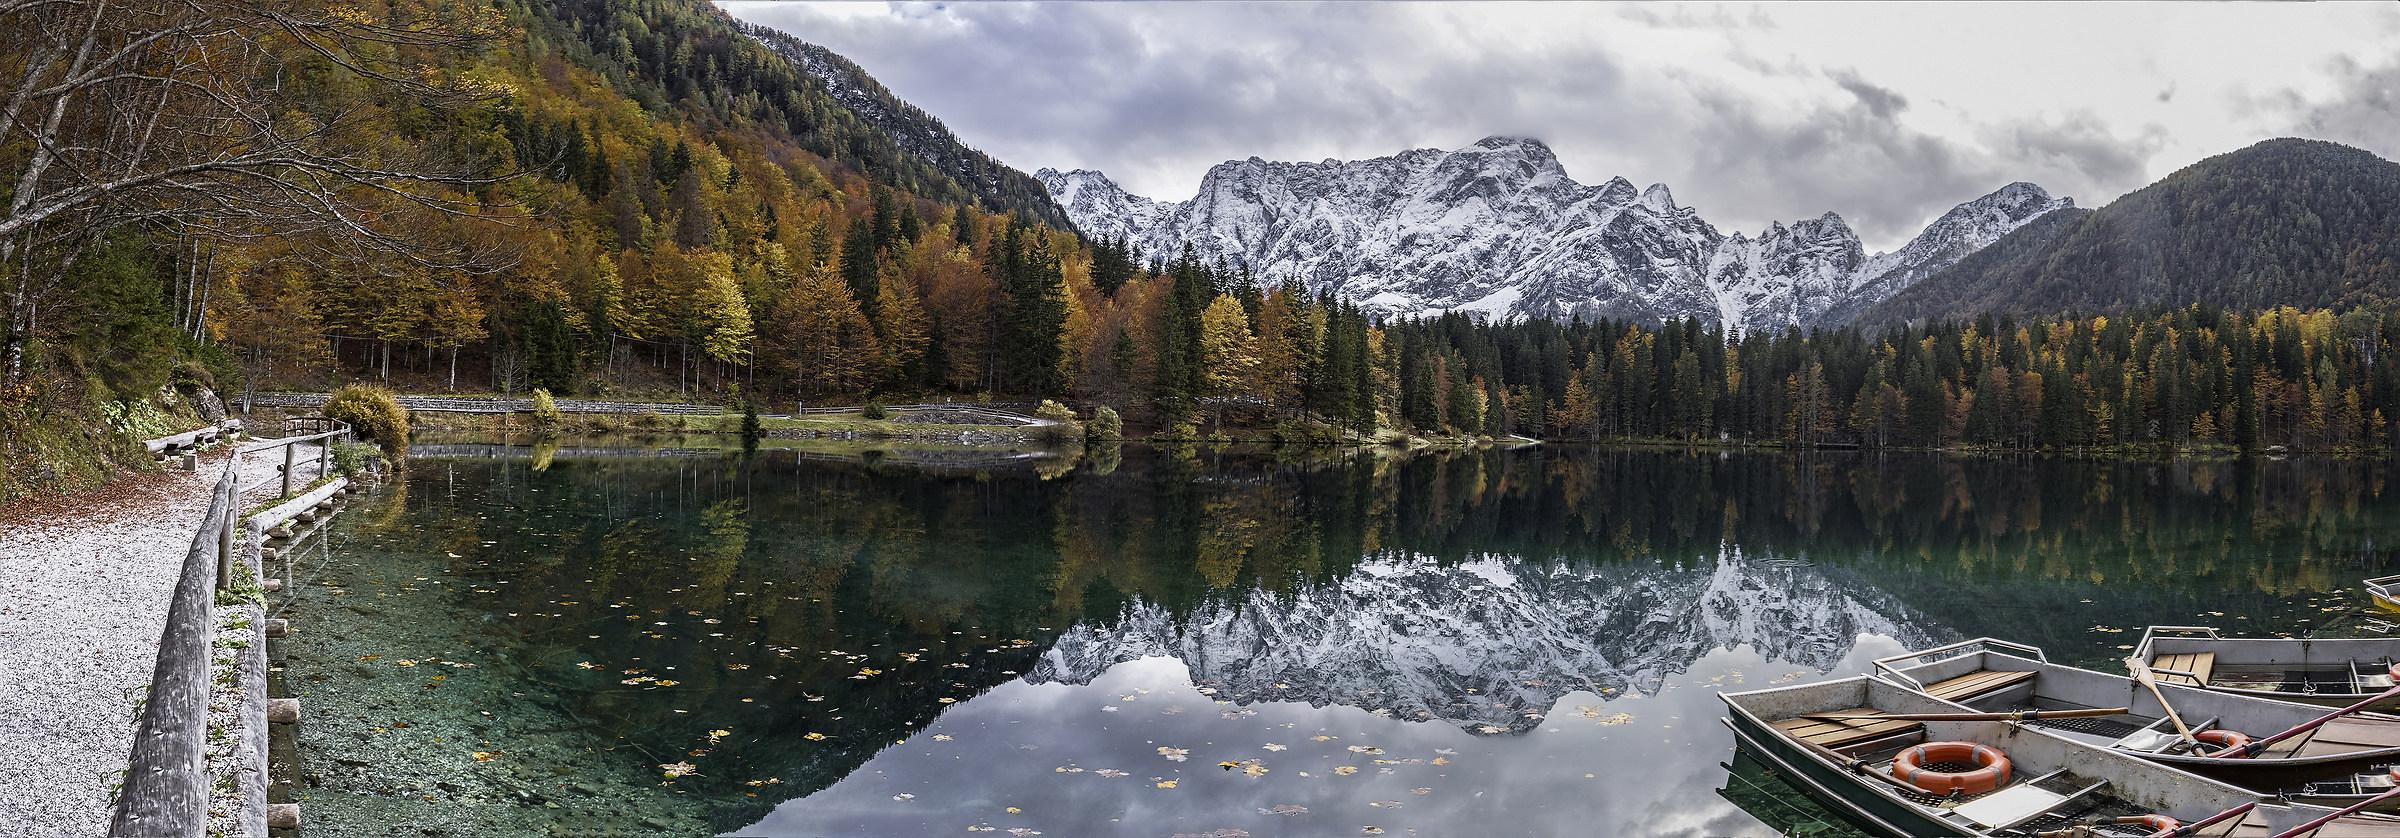 Lower lake of Fusine (ud)...